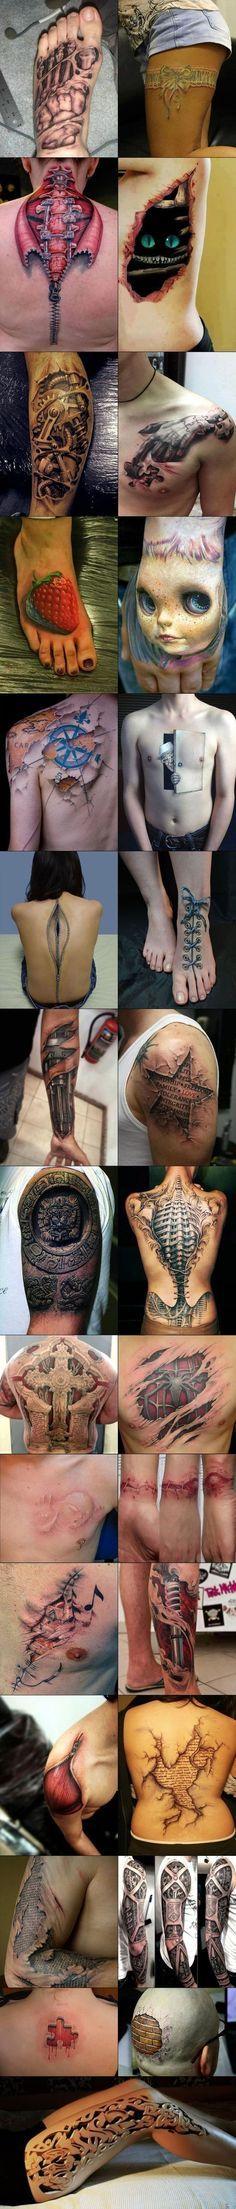 3D Tattoos... Holy shitballs!